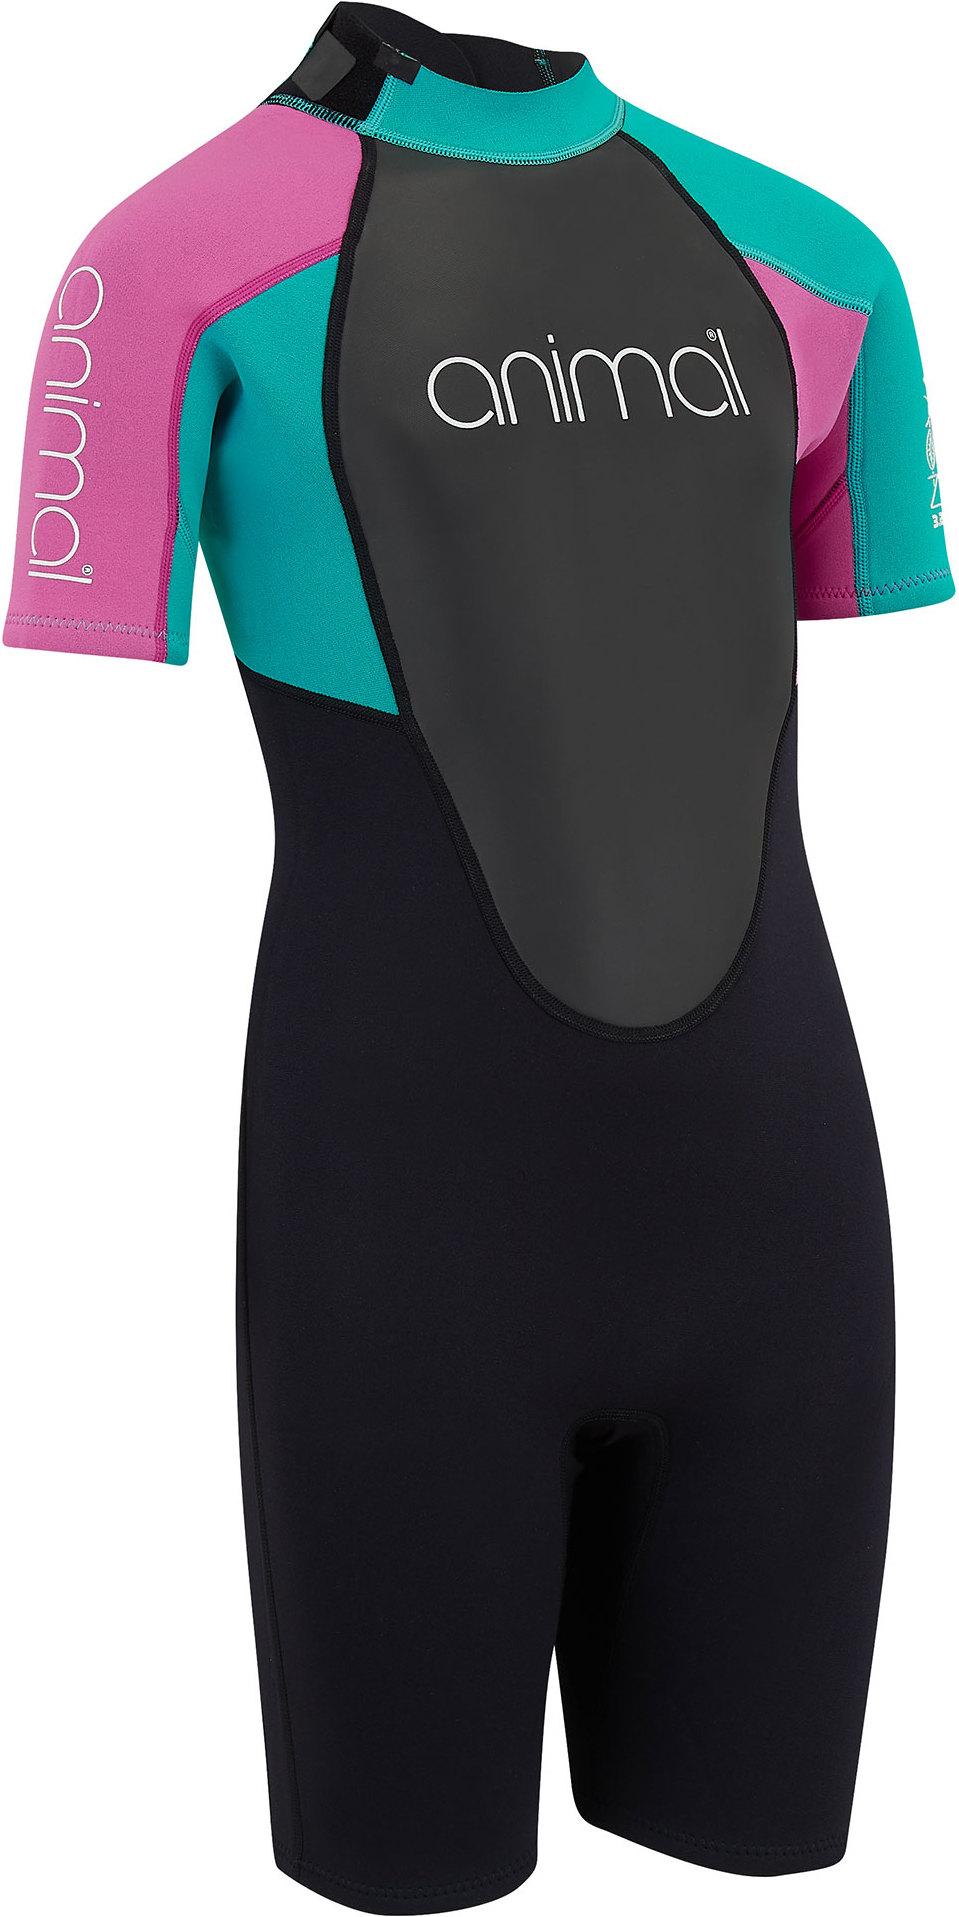 2019 Animal Junior Girls Nova 3/2mm Flatlock Shorty Wetsuit Black AW9SQ803